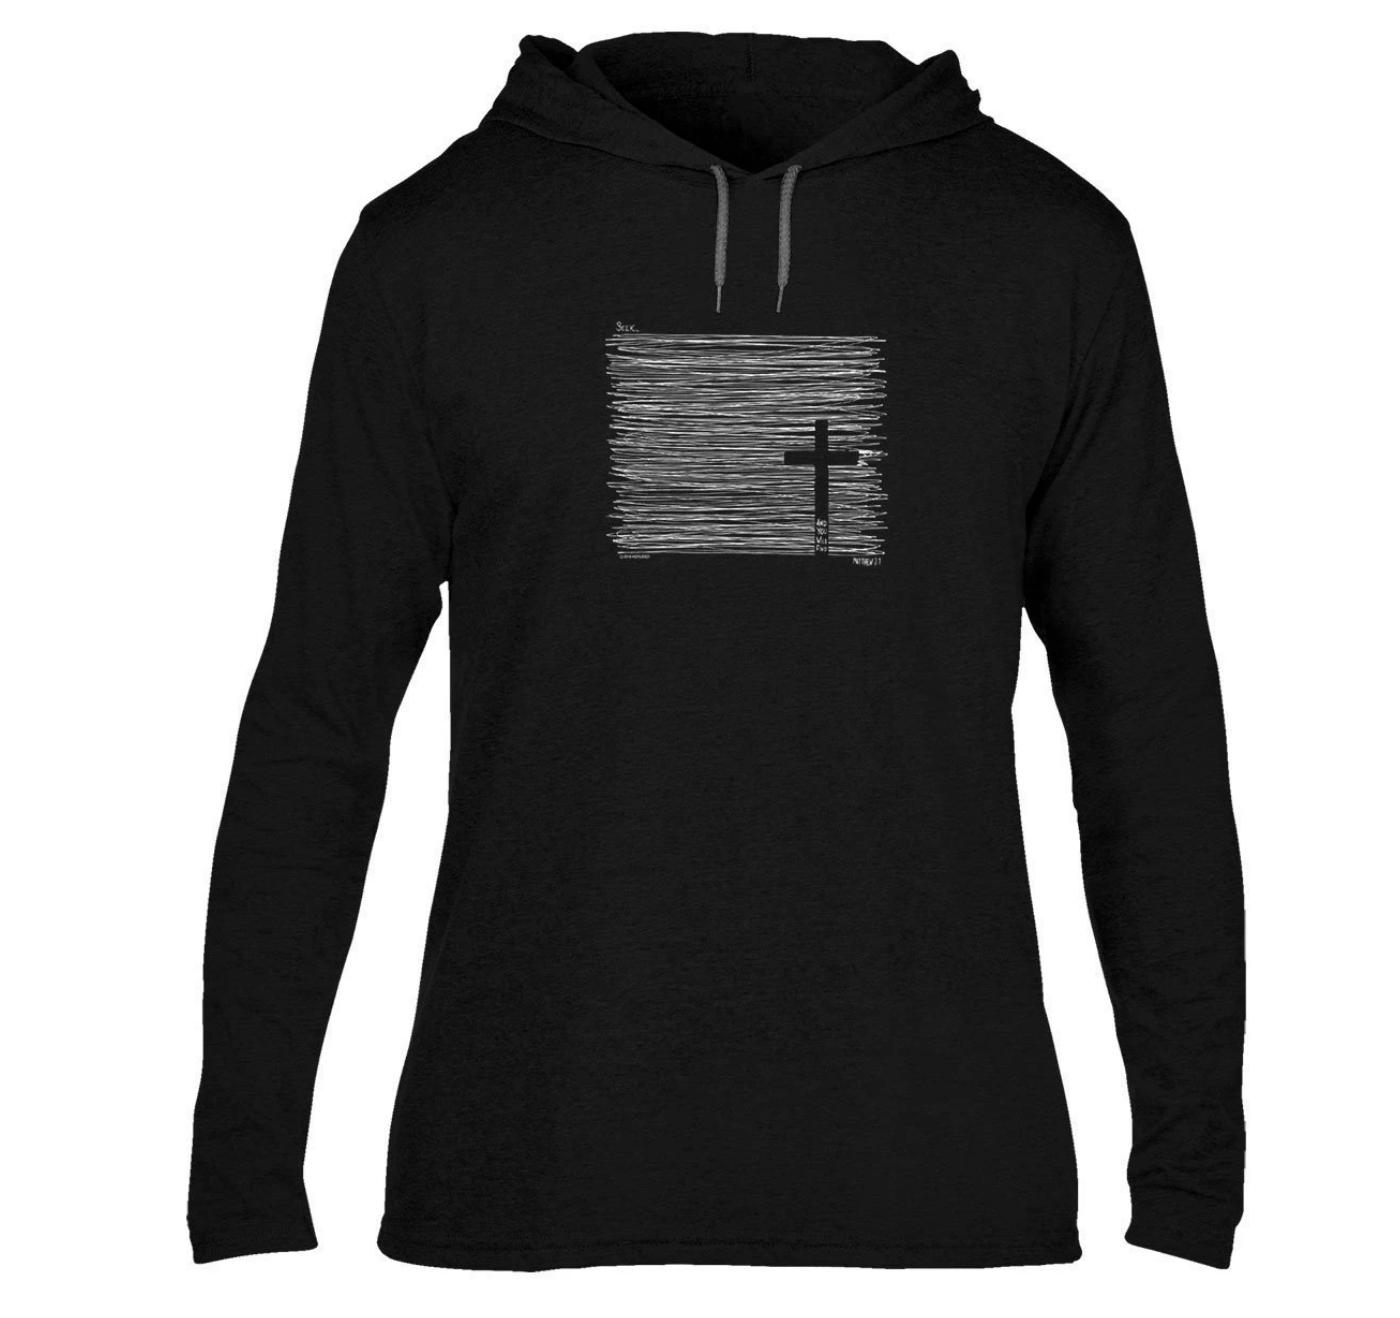 Seek Adult Hooded T-Shirt - FREE Shipping